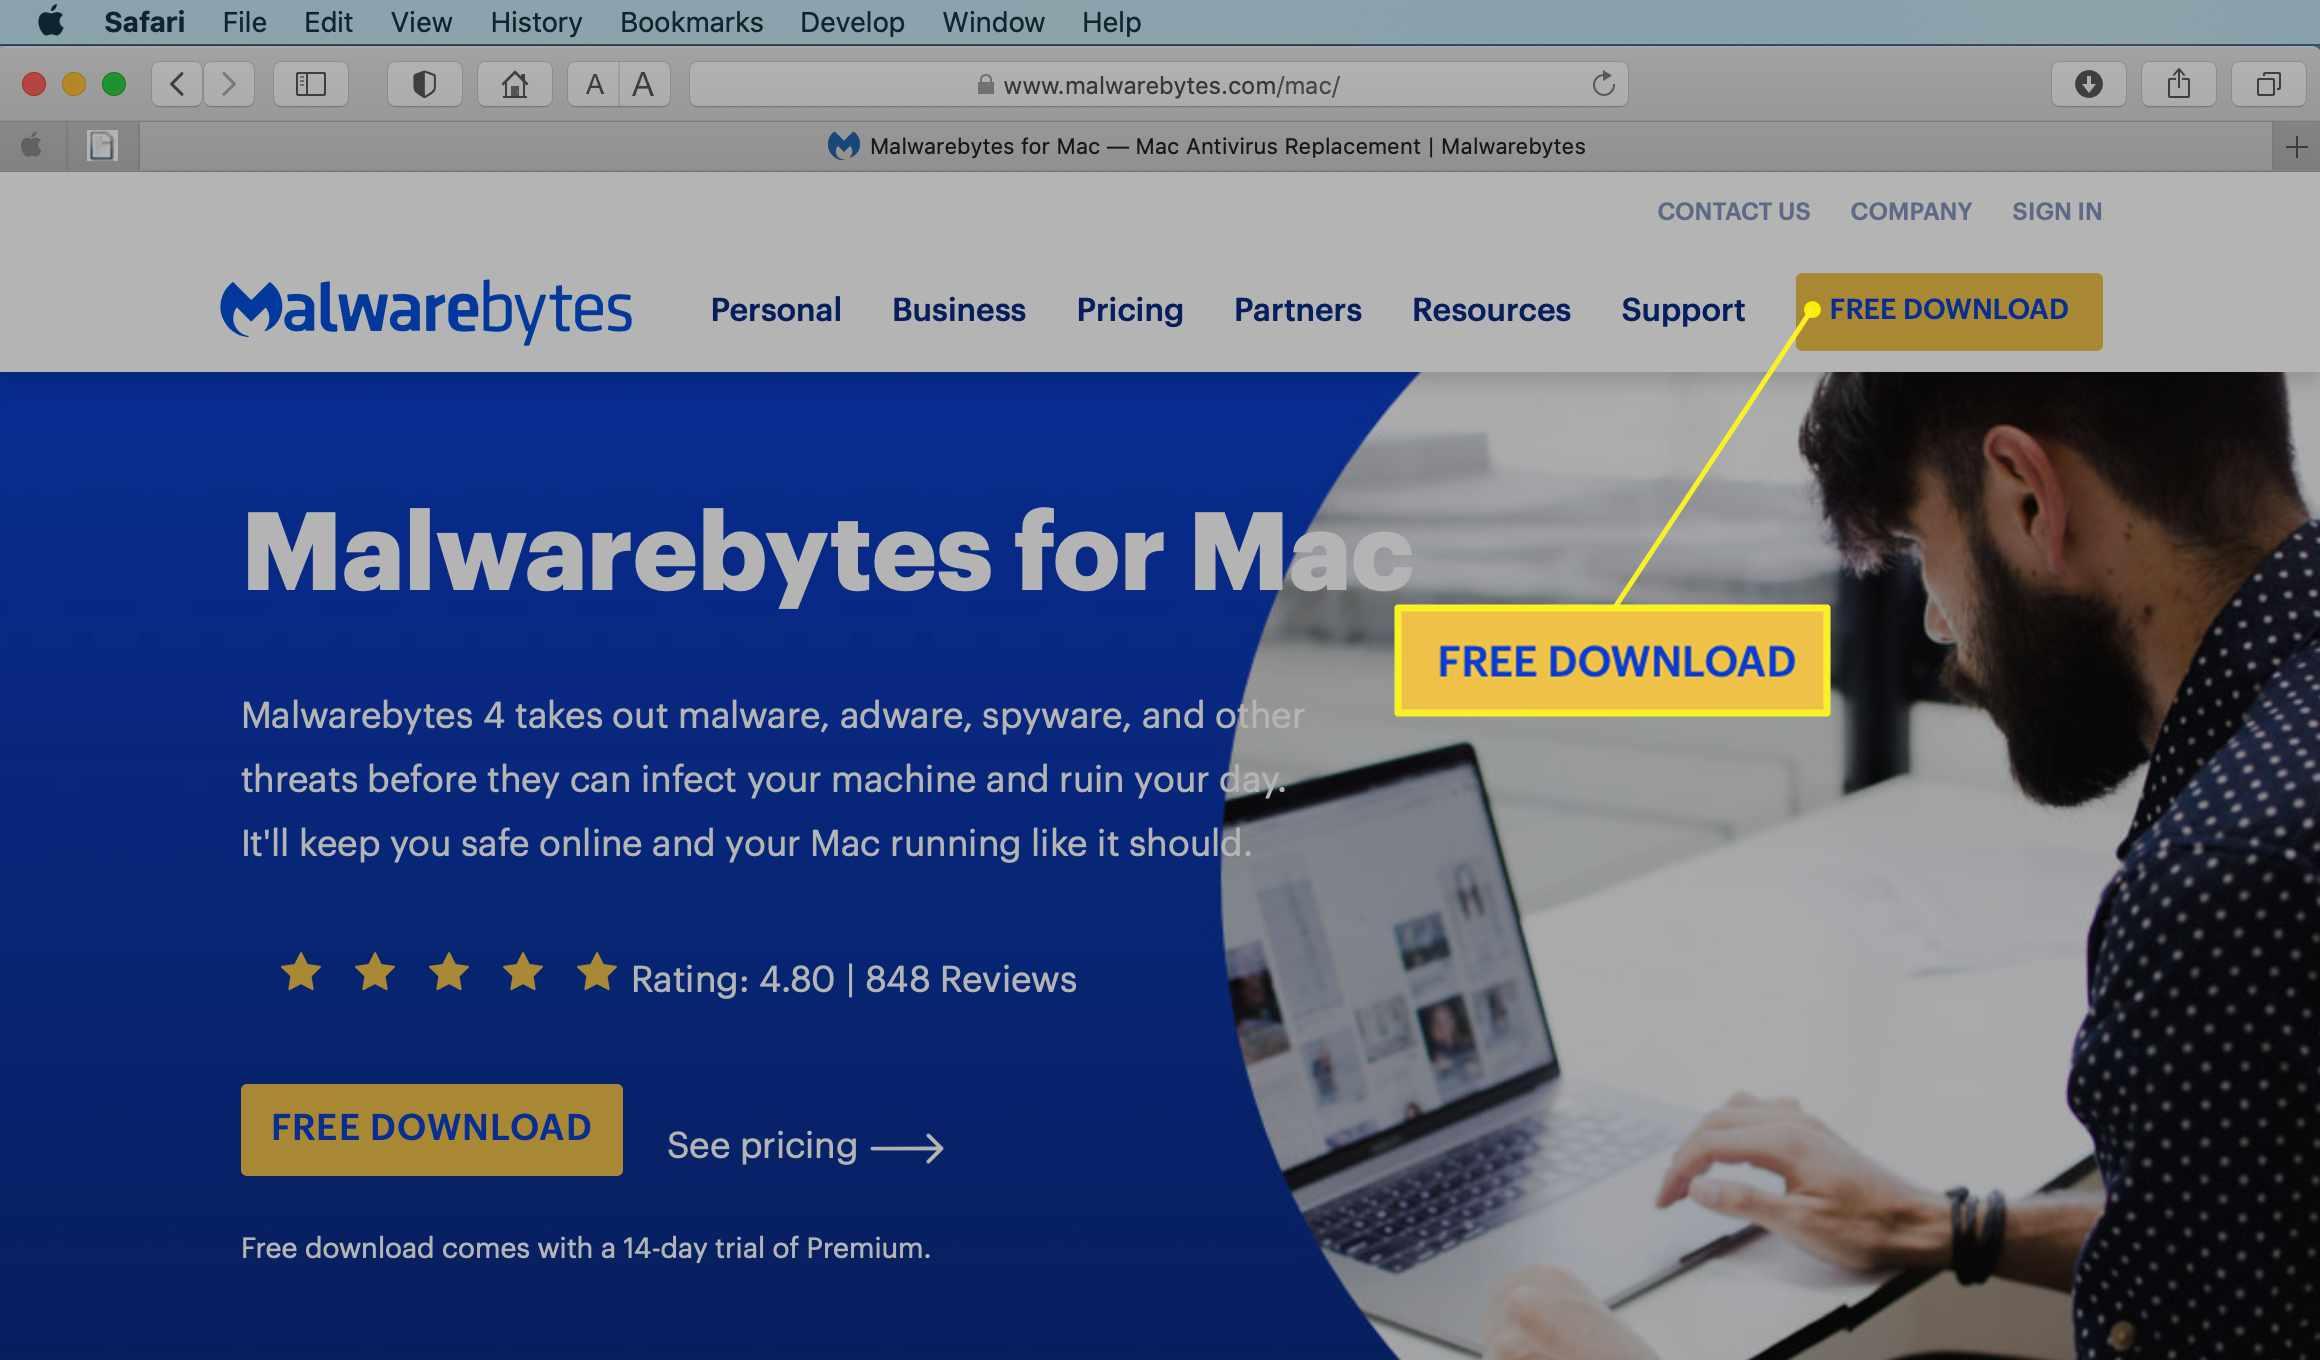 Malwarebytes for Mac website